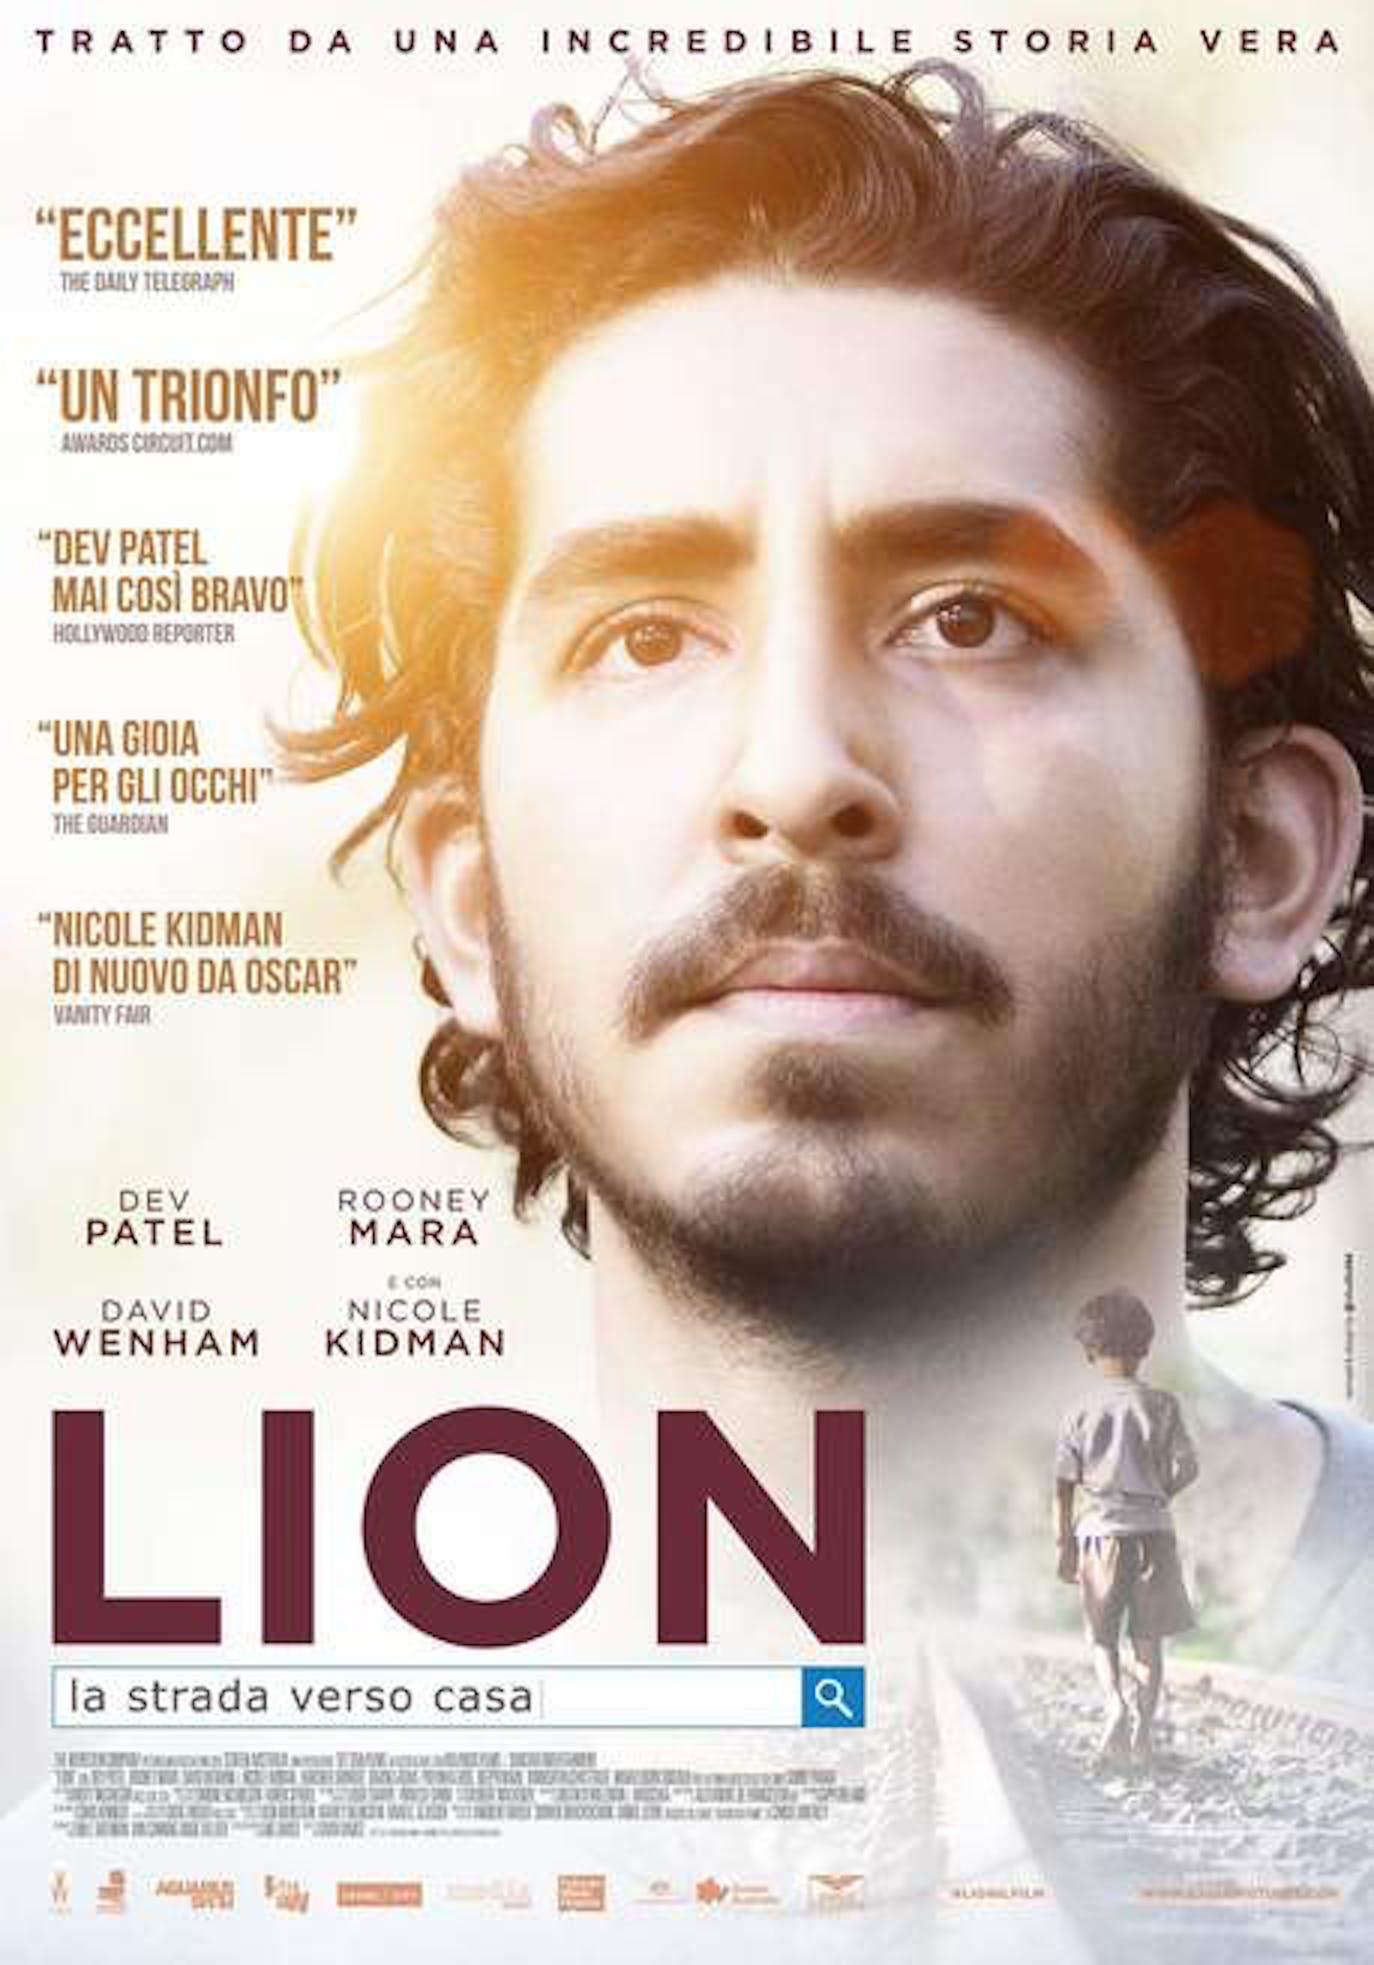 Lion_locandina.jpg